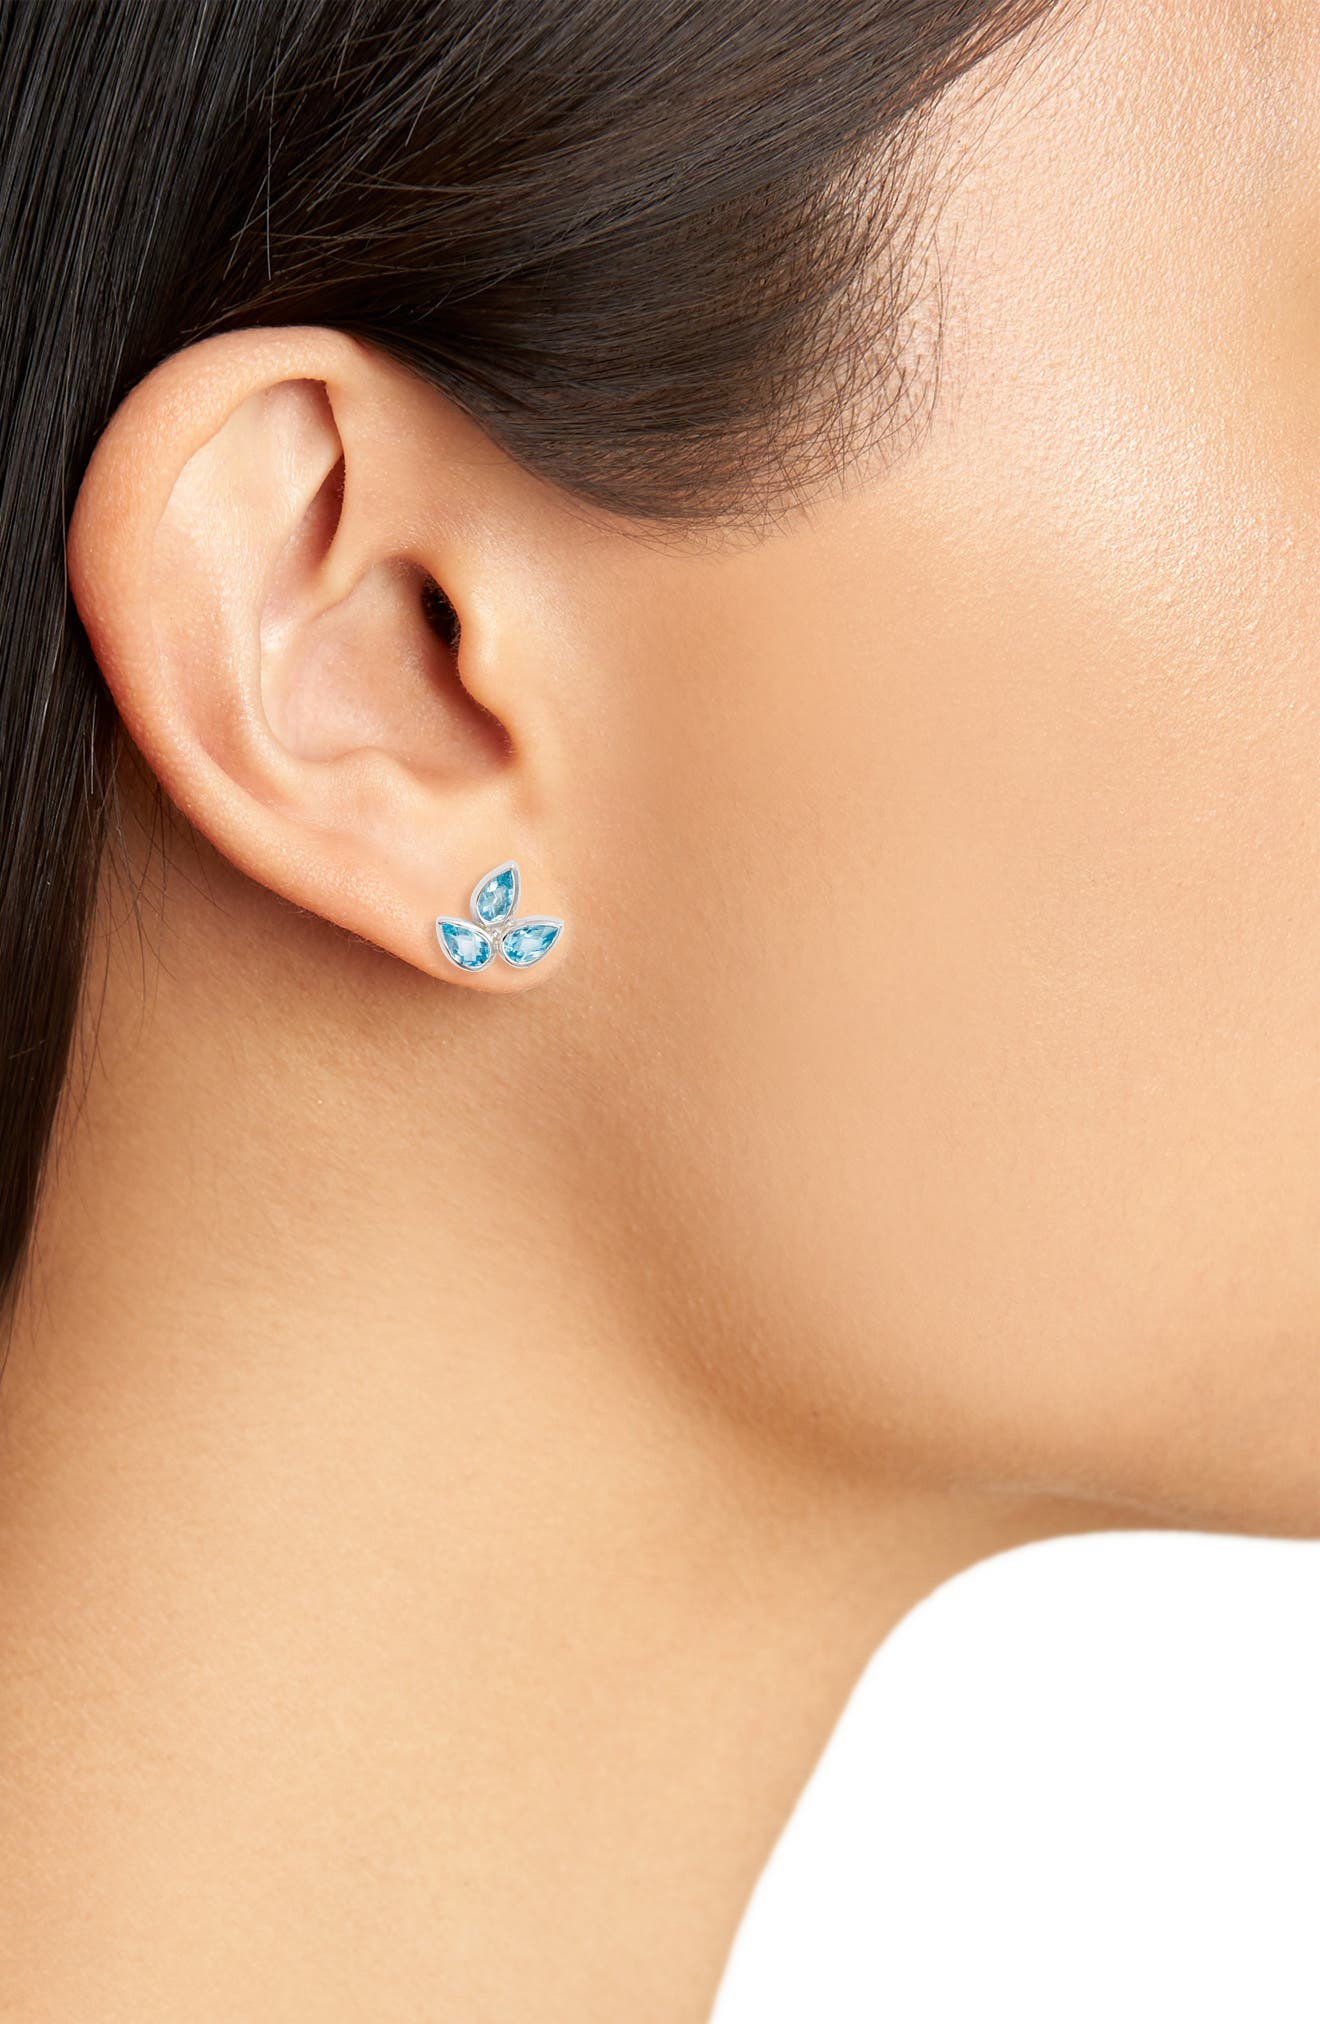 ANZIE,                             Micro Bouquet White Topaz Post Earrings,                             Alternate thumbnail 2, color,                             BLUE TOPAZ